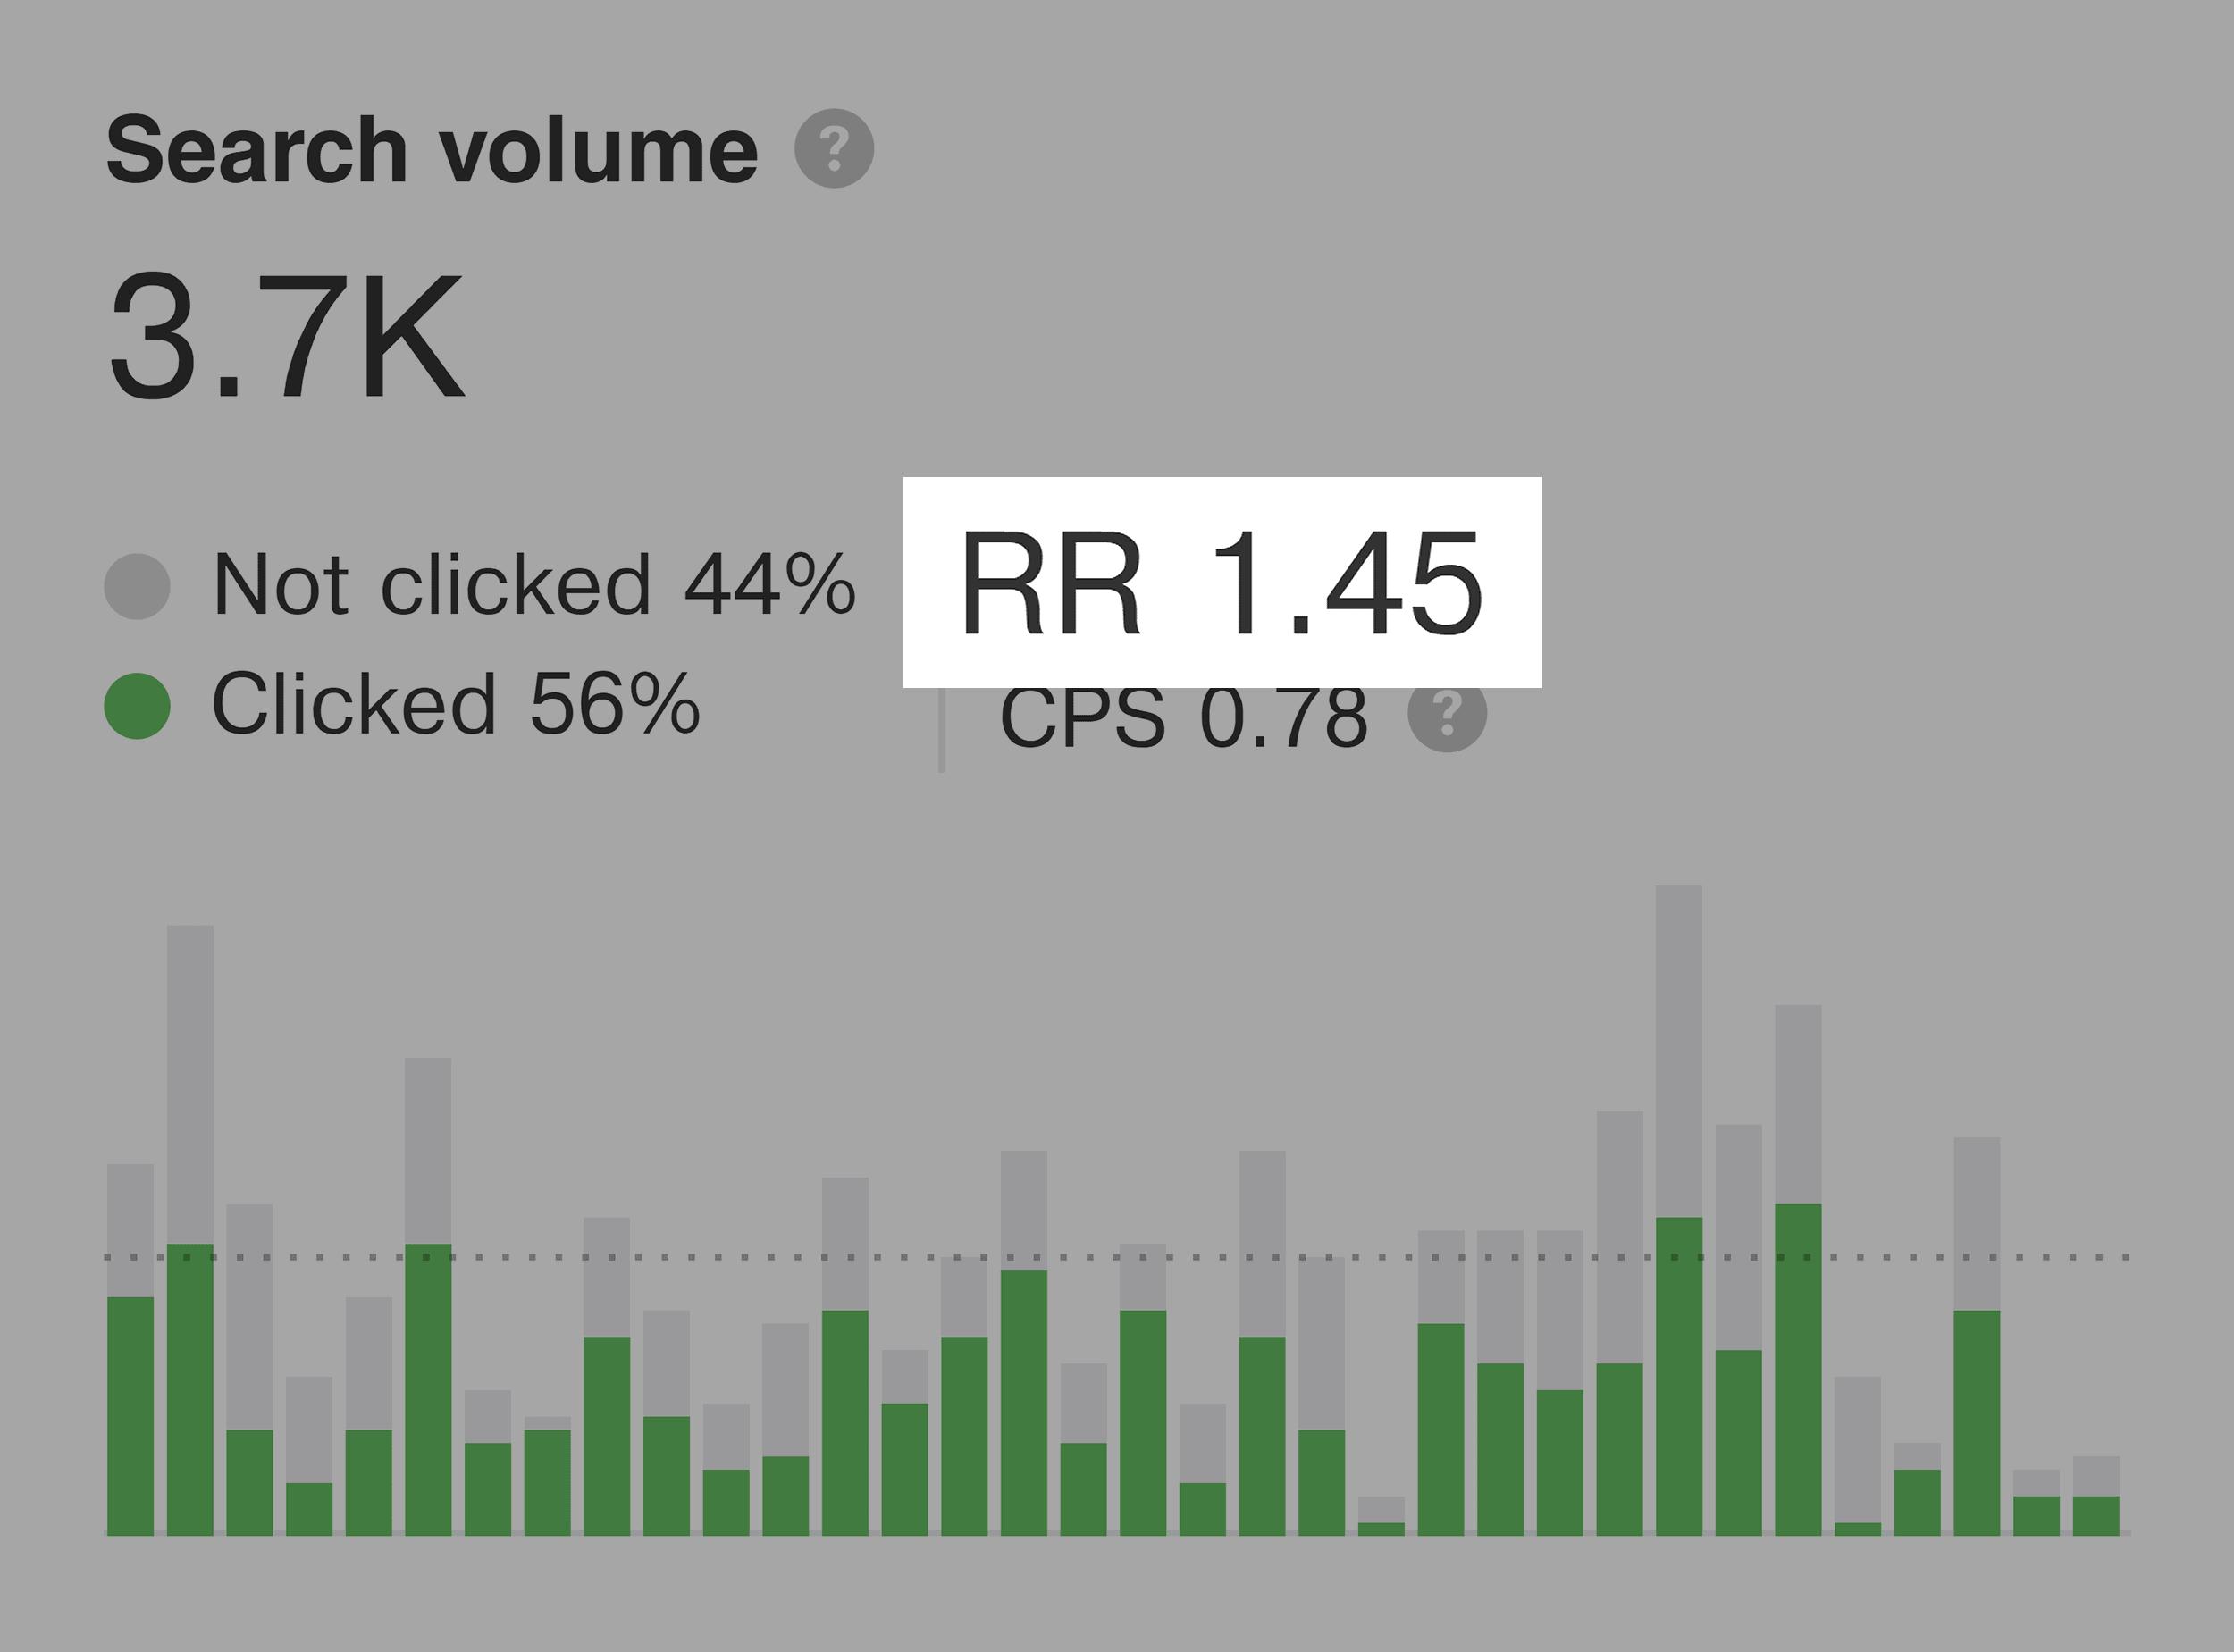 Ahrefs – Search volume – Return rate